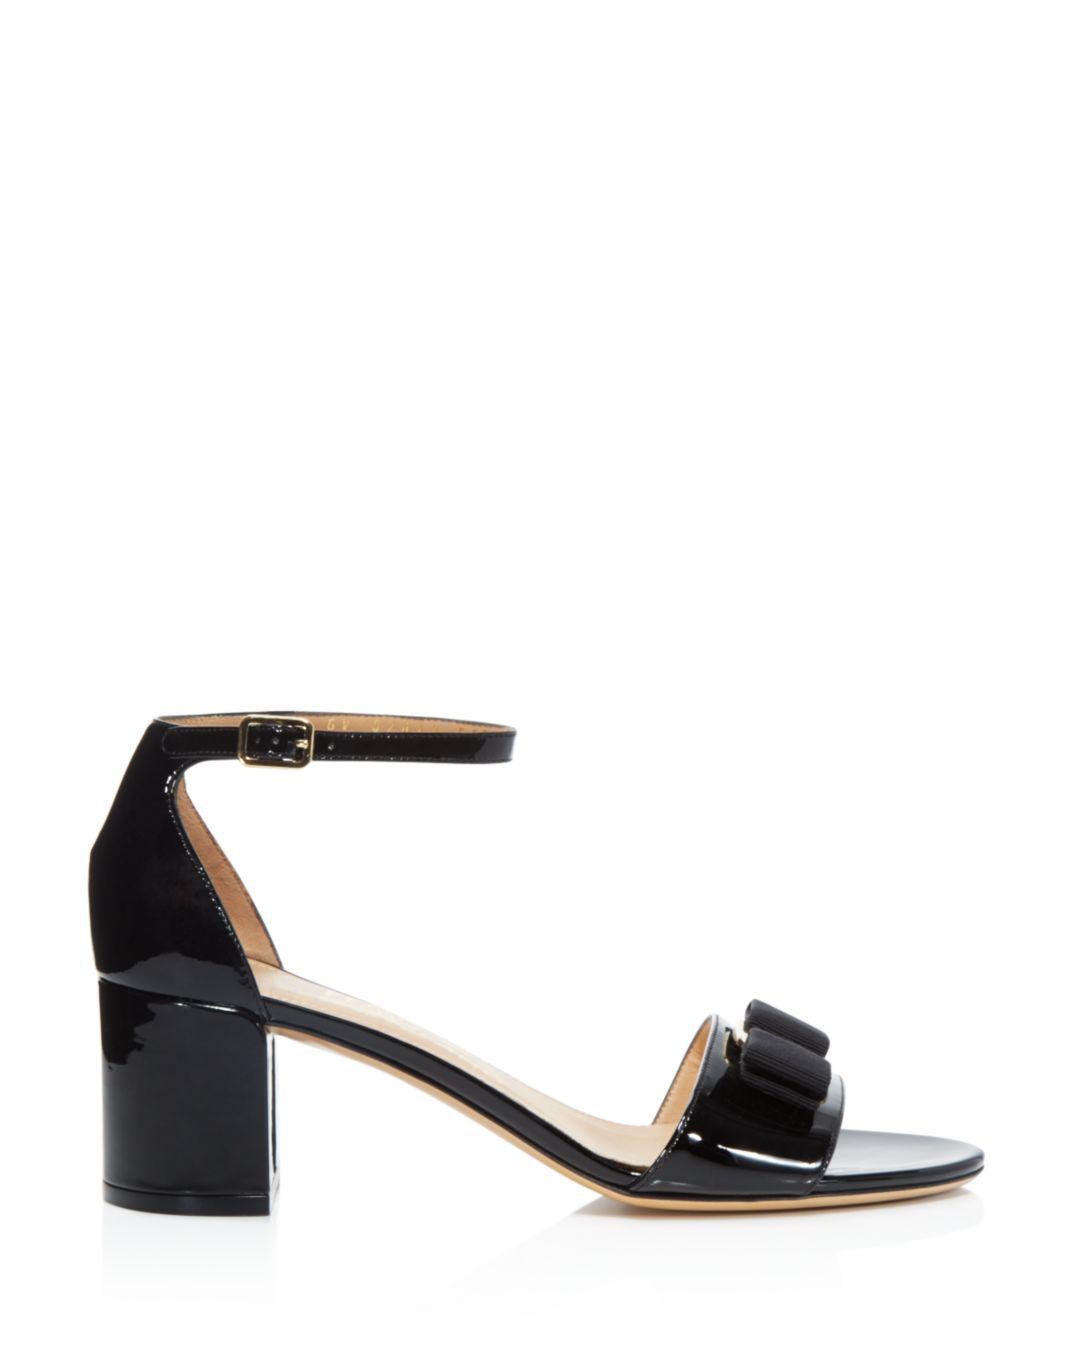 a1e0b22165e0 Lyst - Ferragamo Women s Gavina Ankle Strap Block Heel Sandals in Natural -  Save 8%